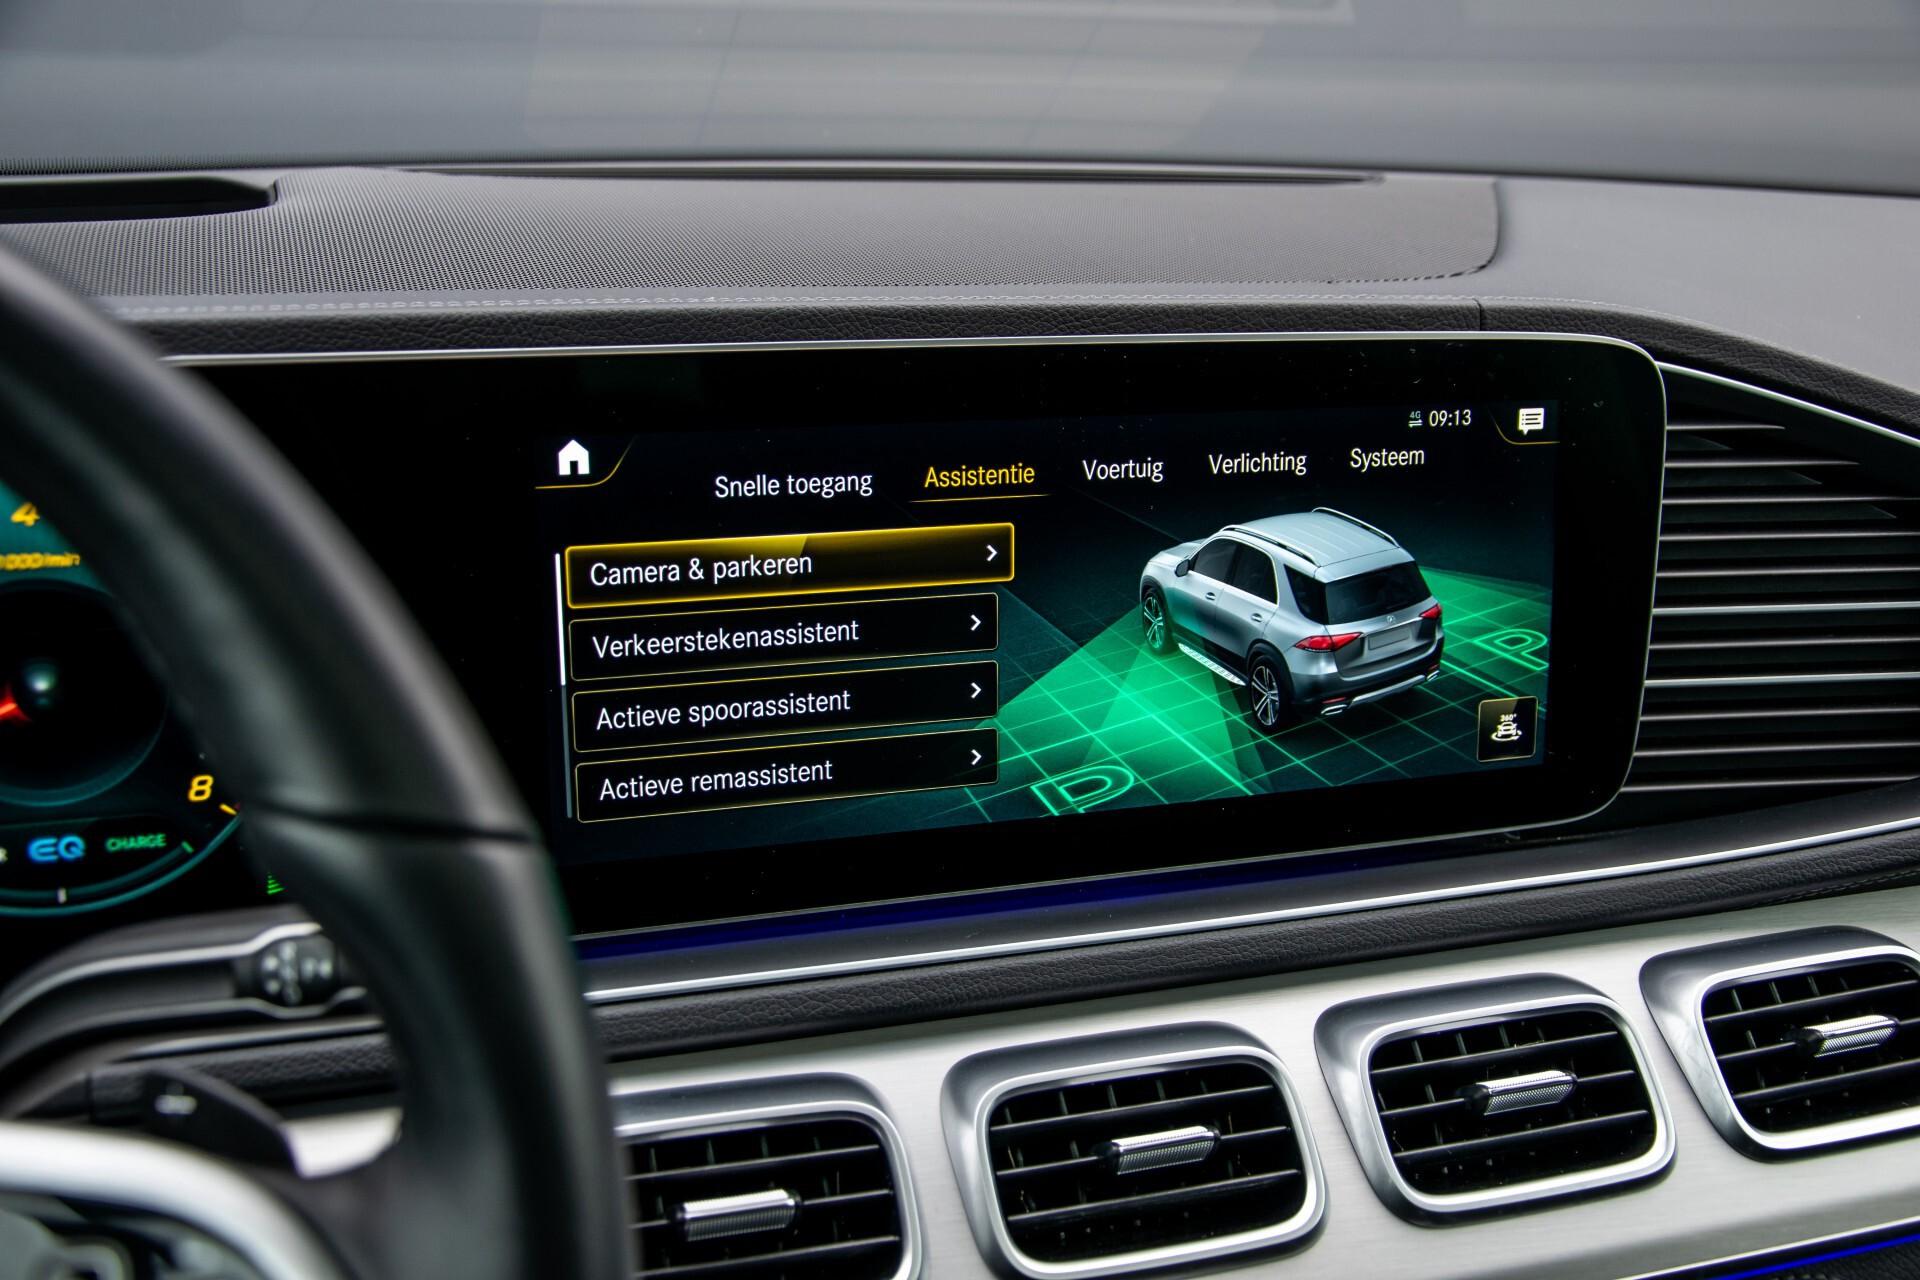 Mercedes-Benz GLE 450 4-M 7-Persoons AMG Massage/Rij-assist/Keyless/TV/360/Night/Trekhaak Aut9 Foto 28